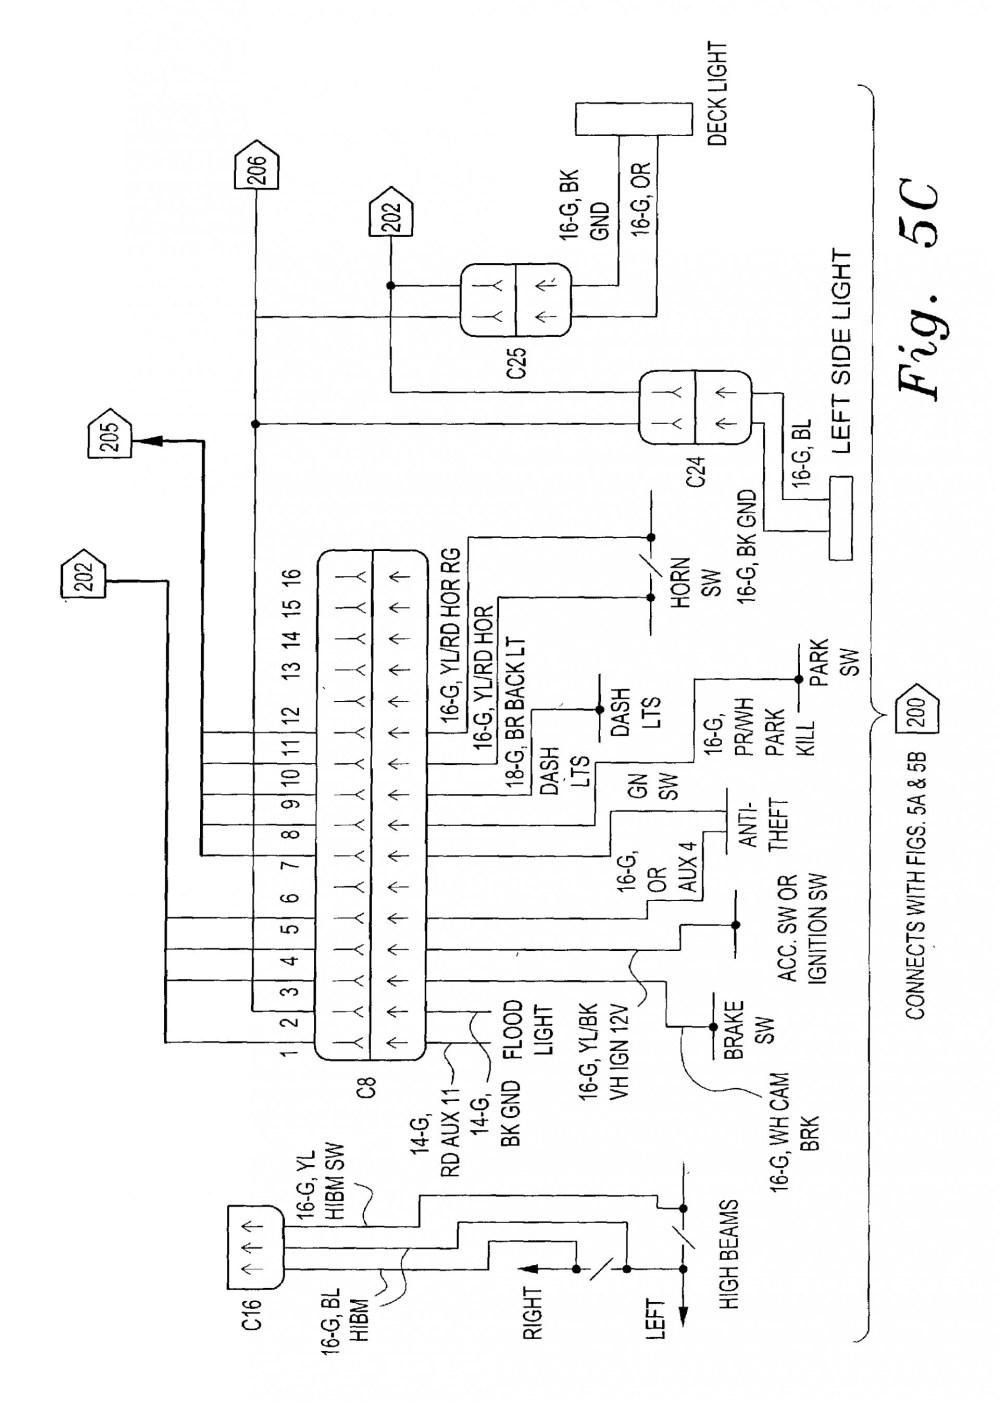 medium resolution of 12vdc strobe power supply wiring diagram get free image about wiring aircraft strobe wiring llv wiring